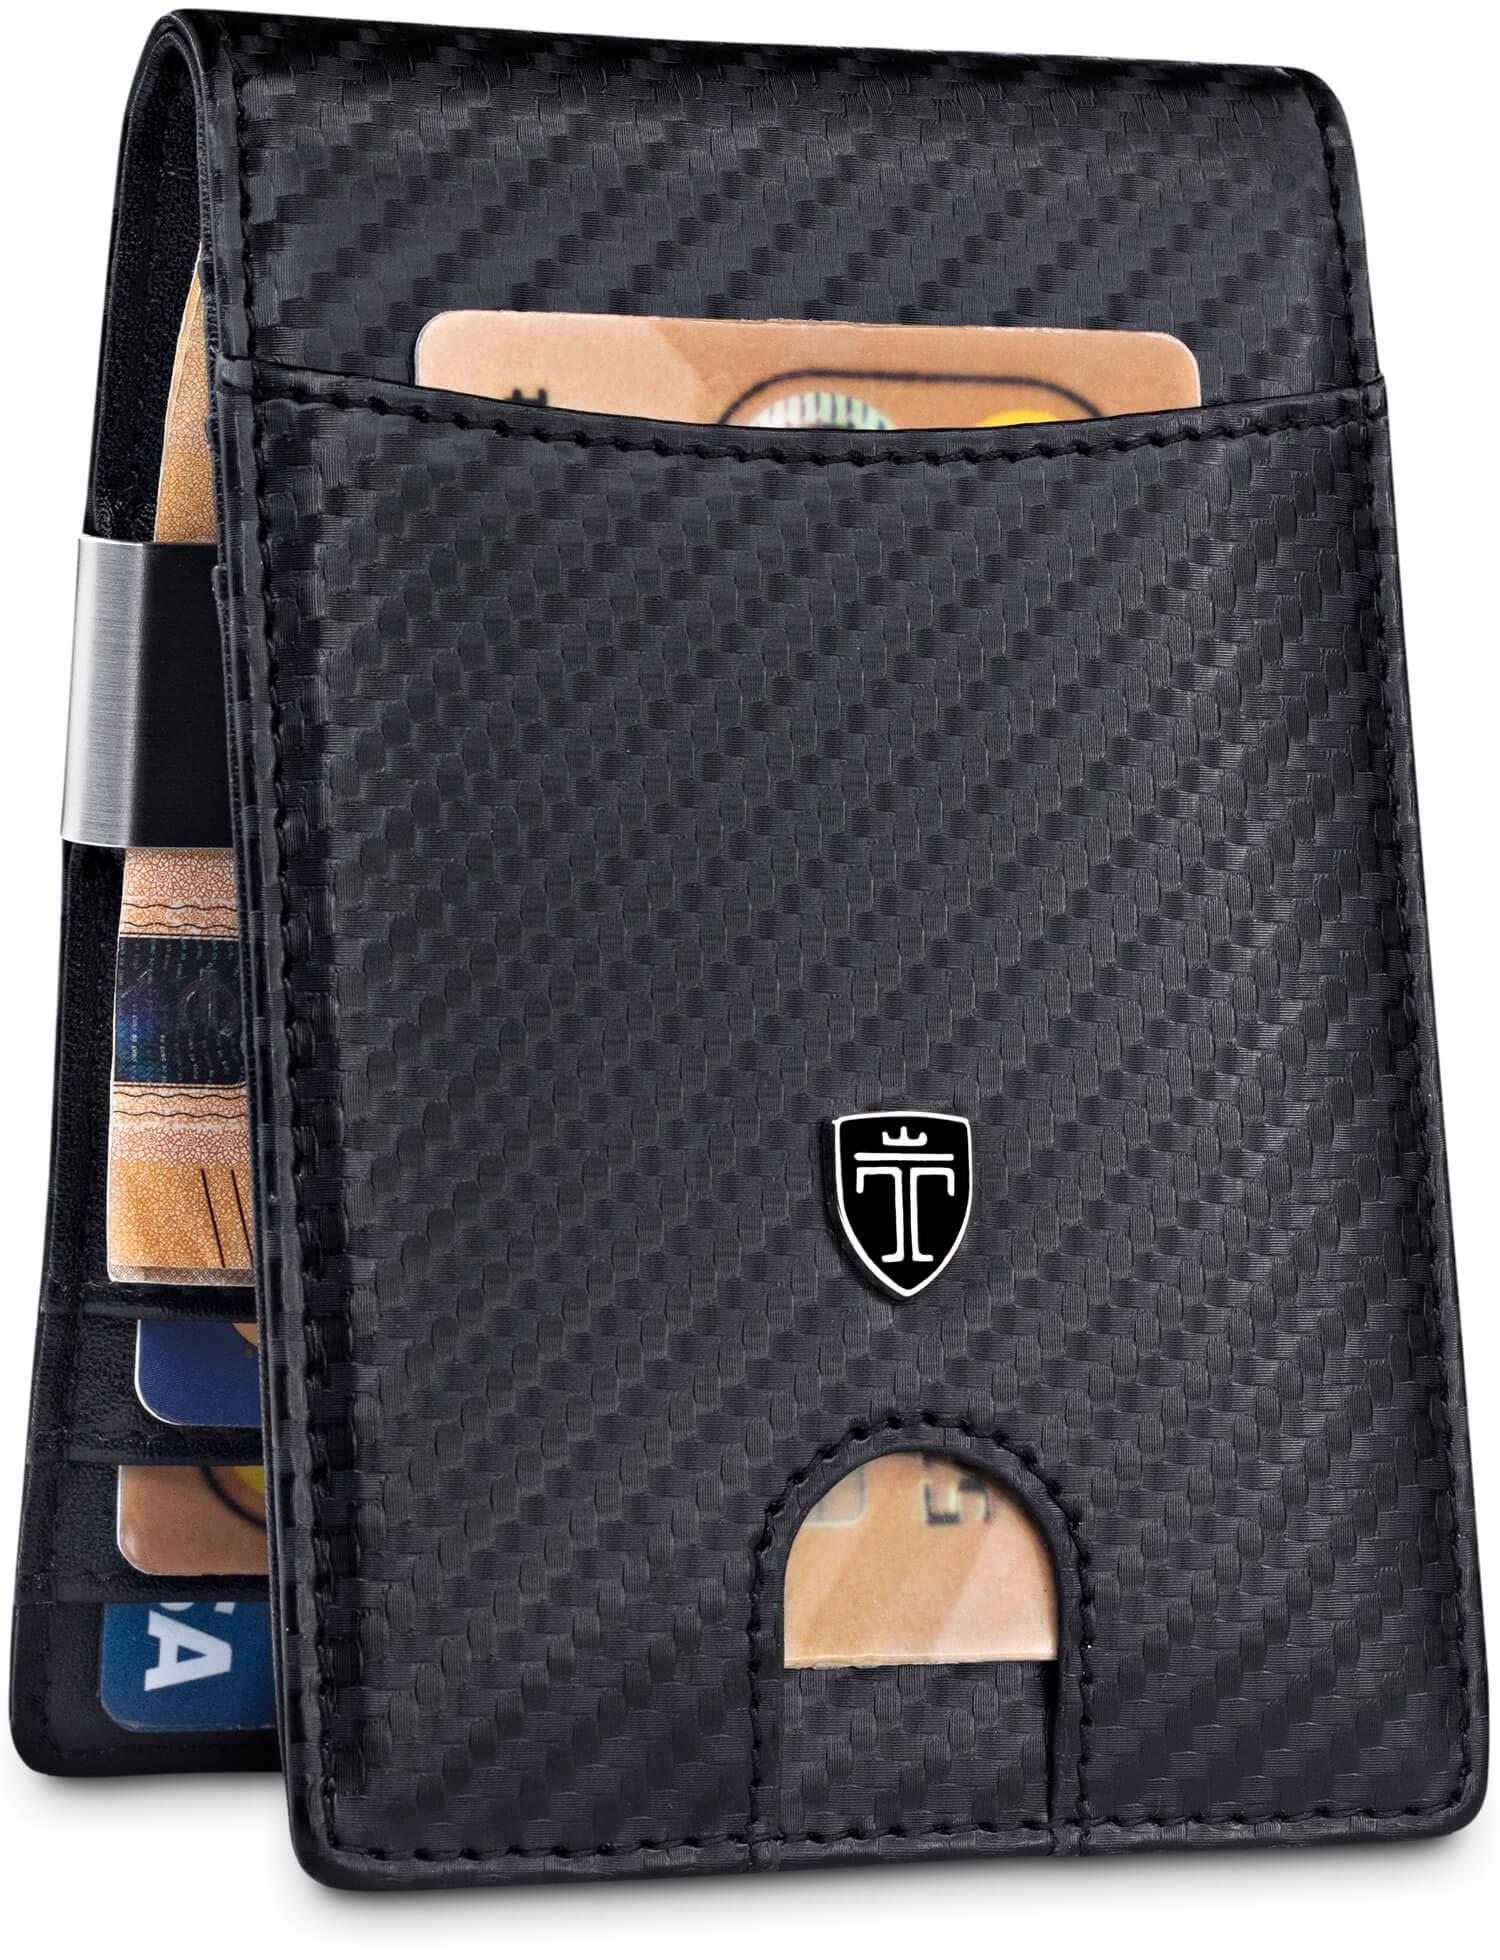 TRAVANDO Money Clip Wallet''RIO'' Mens Wallet Front Pocket Wallet Slim Wallet RFID Blocking - Credit Card Holder - Minimalist Mini Bifold Gifts for Men (Carbon) by TRAVANDO